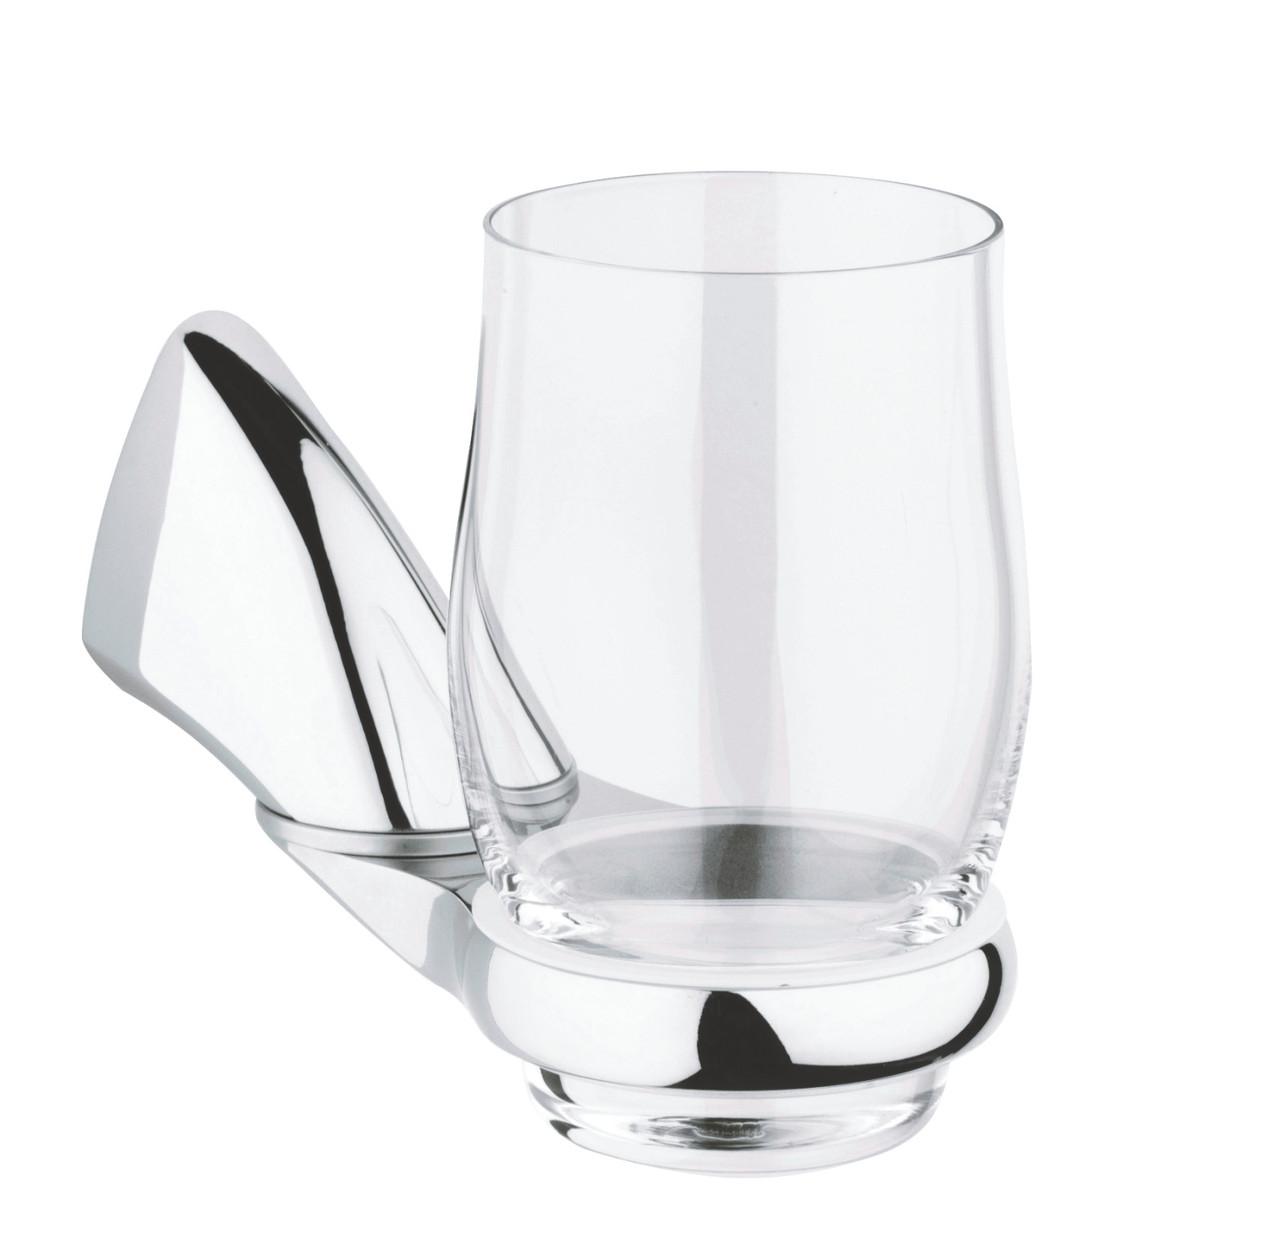 Chiara Держатель для стакана (без стакана)